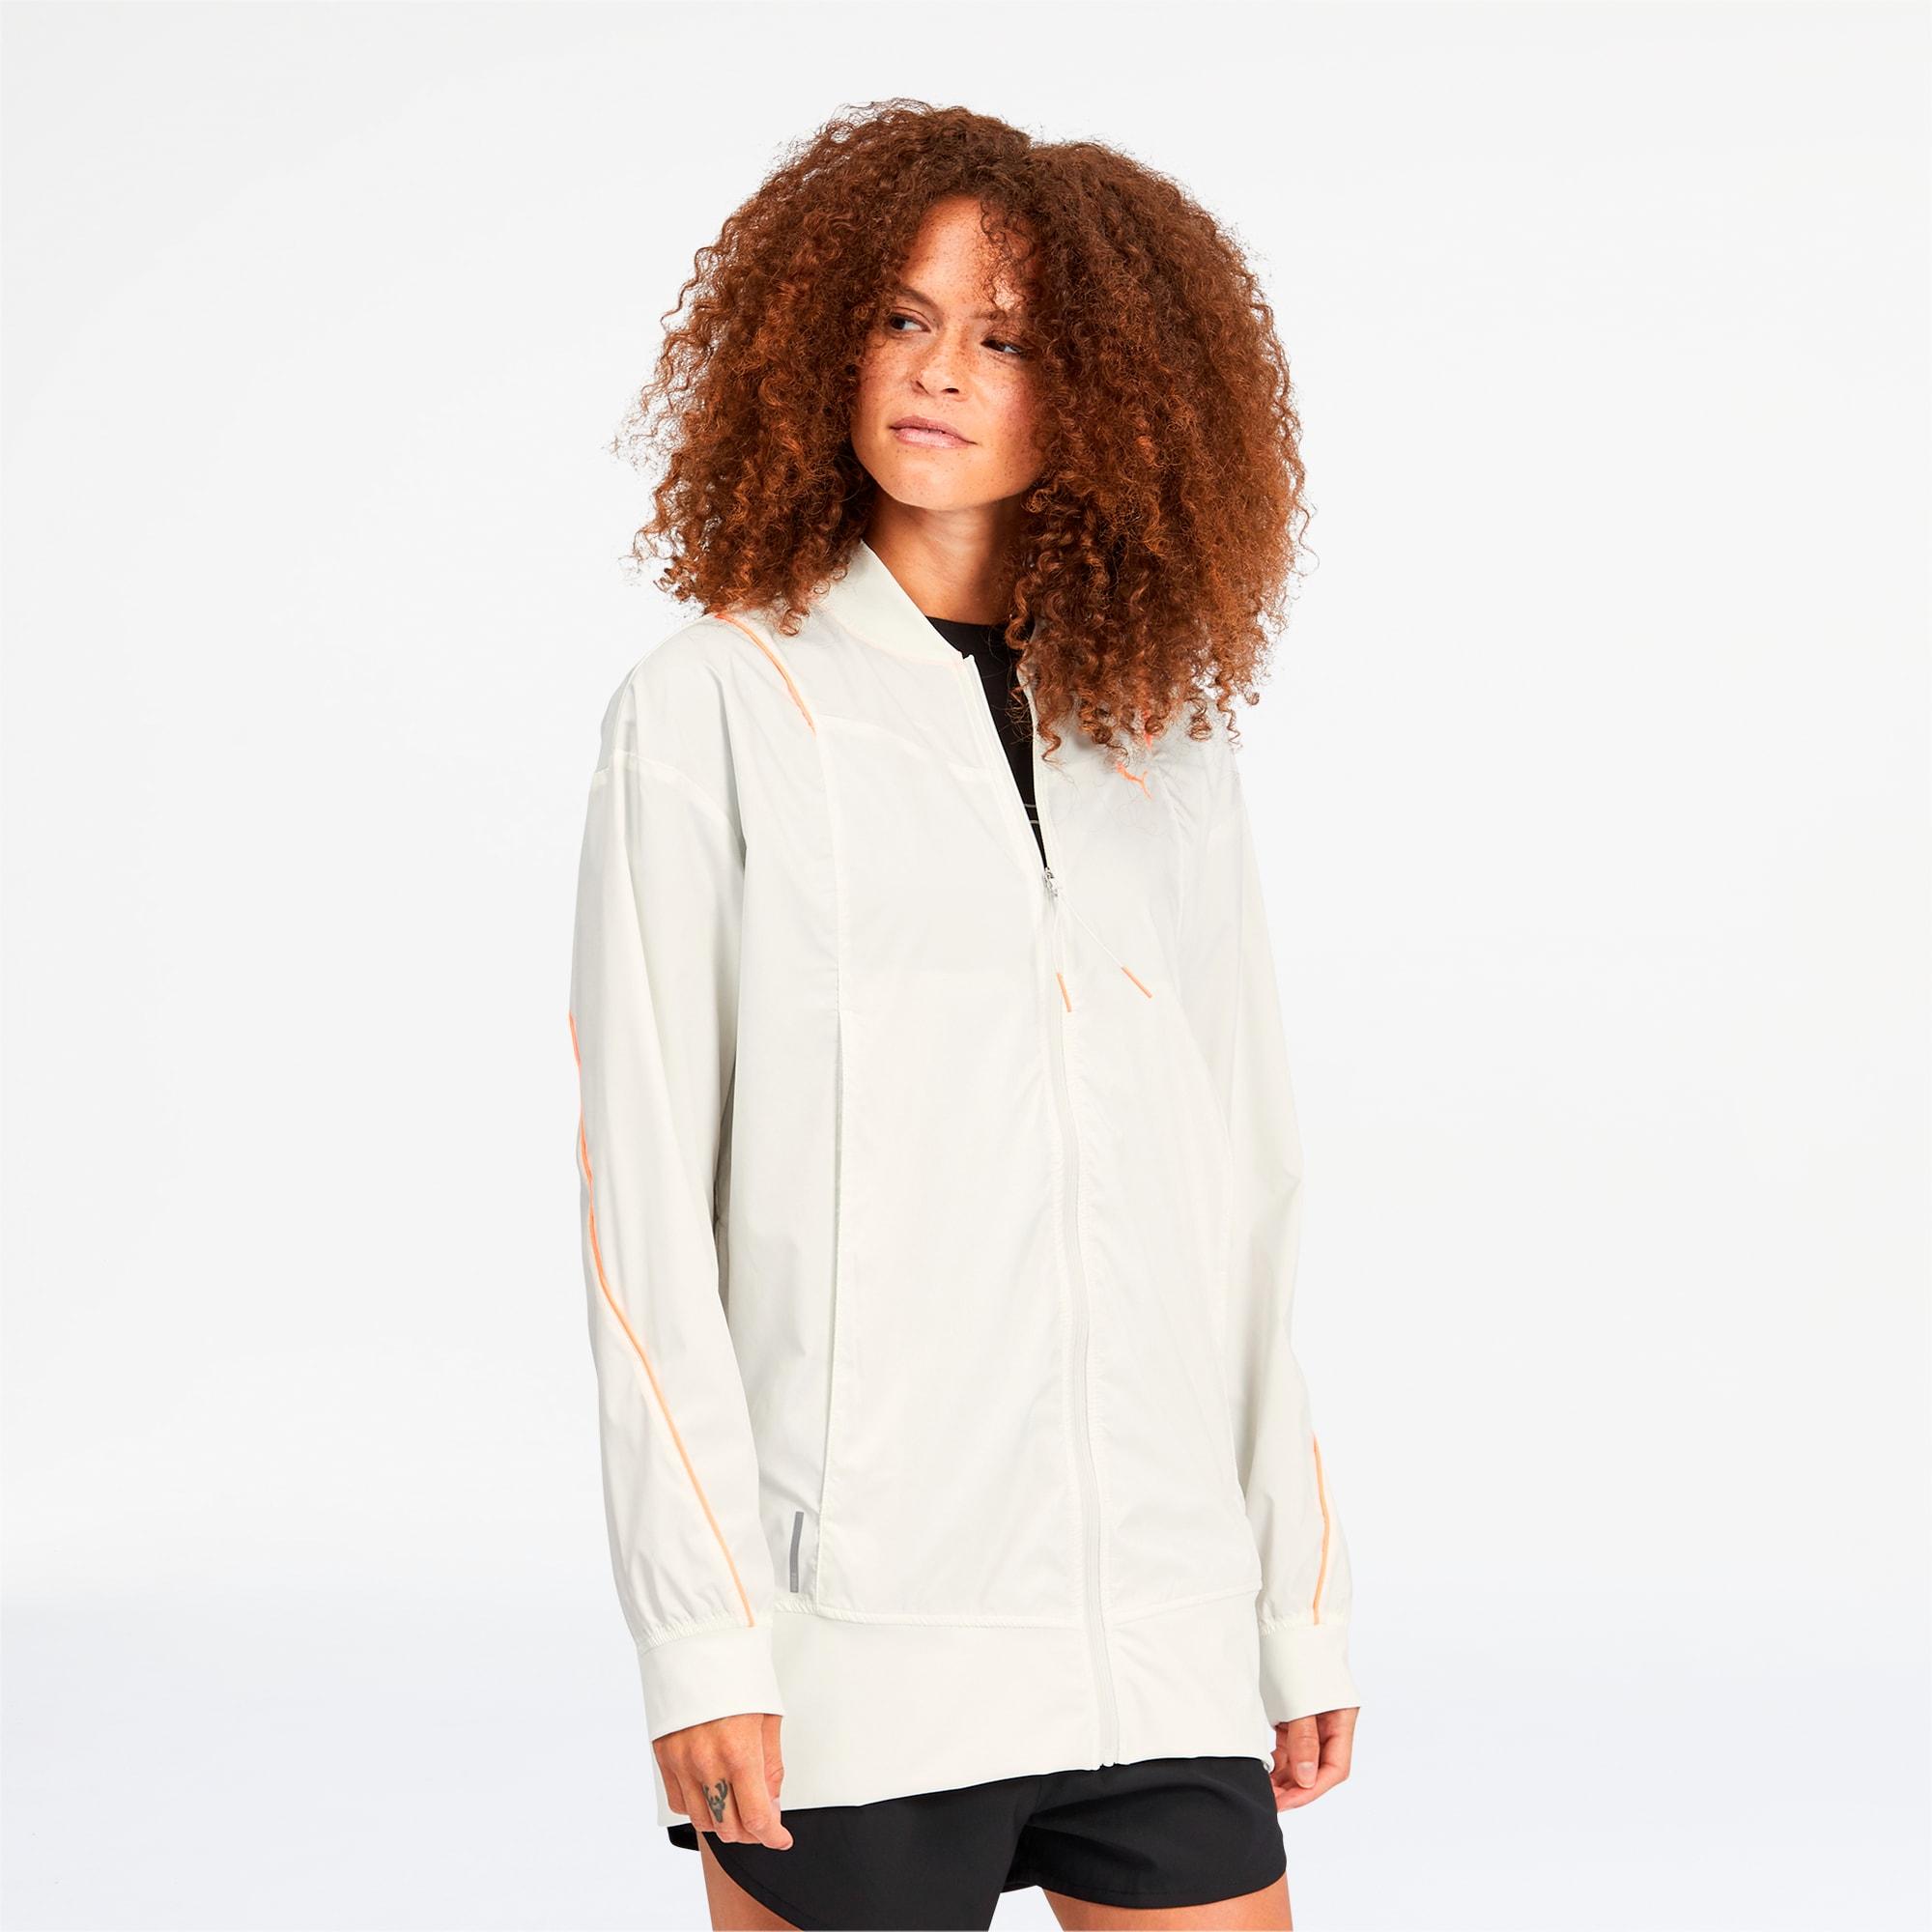 puma -  Pearl Gewebte Damen Trainingsjacke | Mit Aucun | Weiß | Größe: S